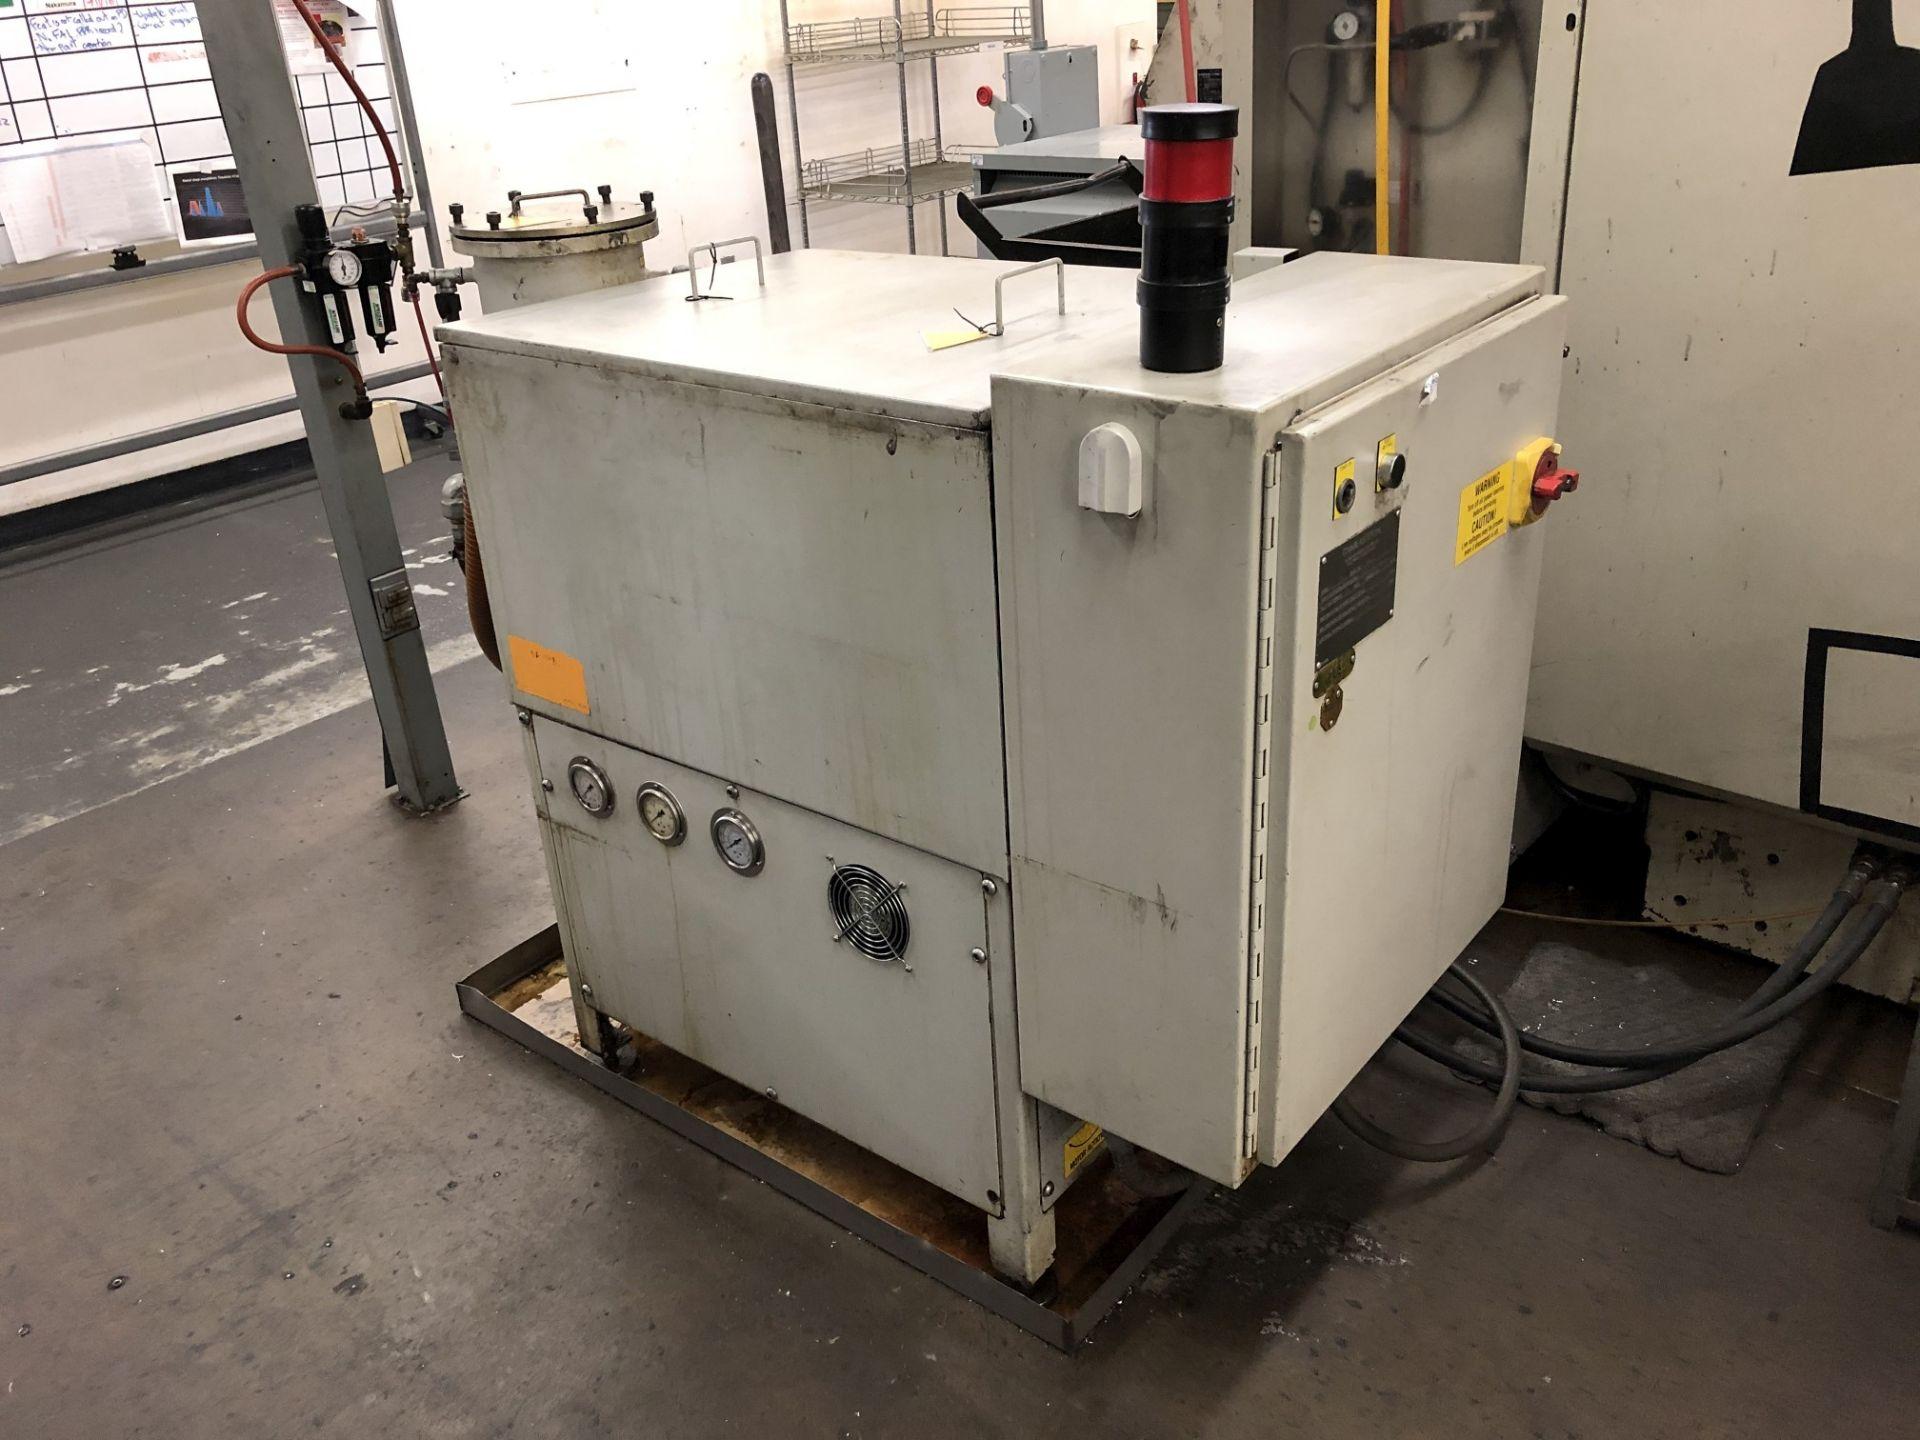 1999 Kitako MT4-200 Multi-Spindle CNC Turning Mill - Image 14 of 17